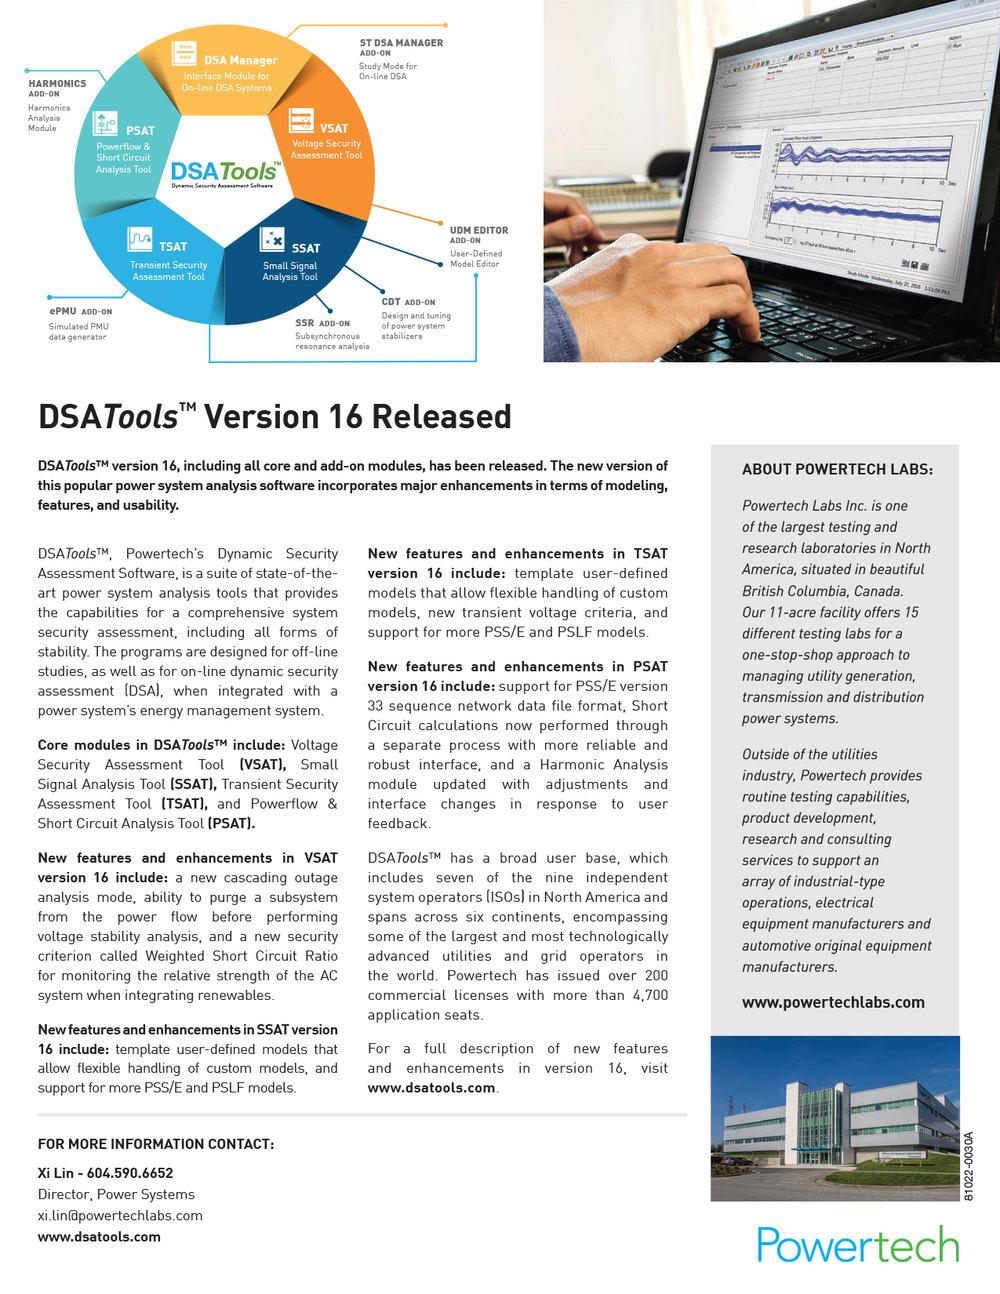 DSA Tools Version 16 A.jpg